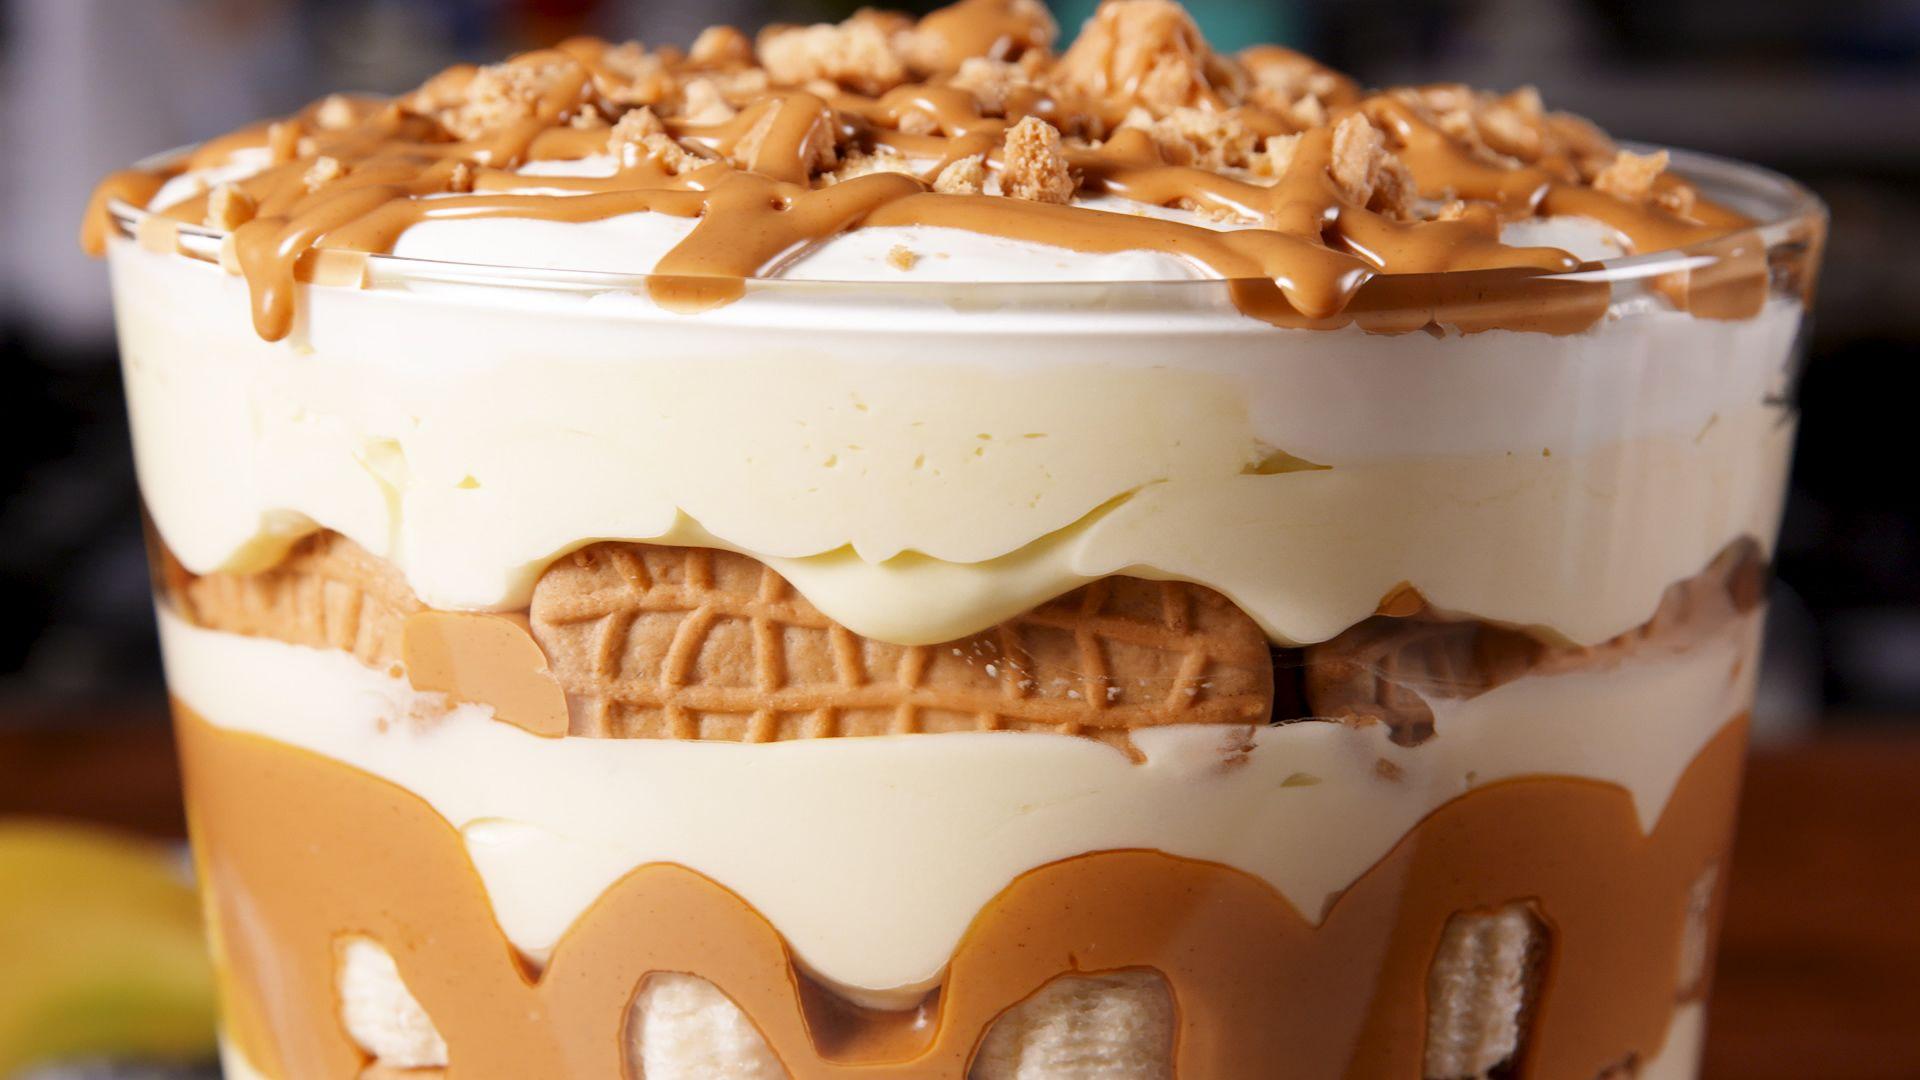 Best Peanut Butter Banana Pudding Recipe How To Make Peanut Butter Banana Pudding